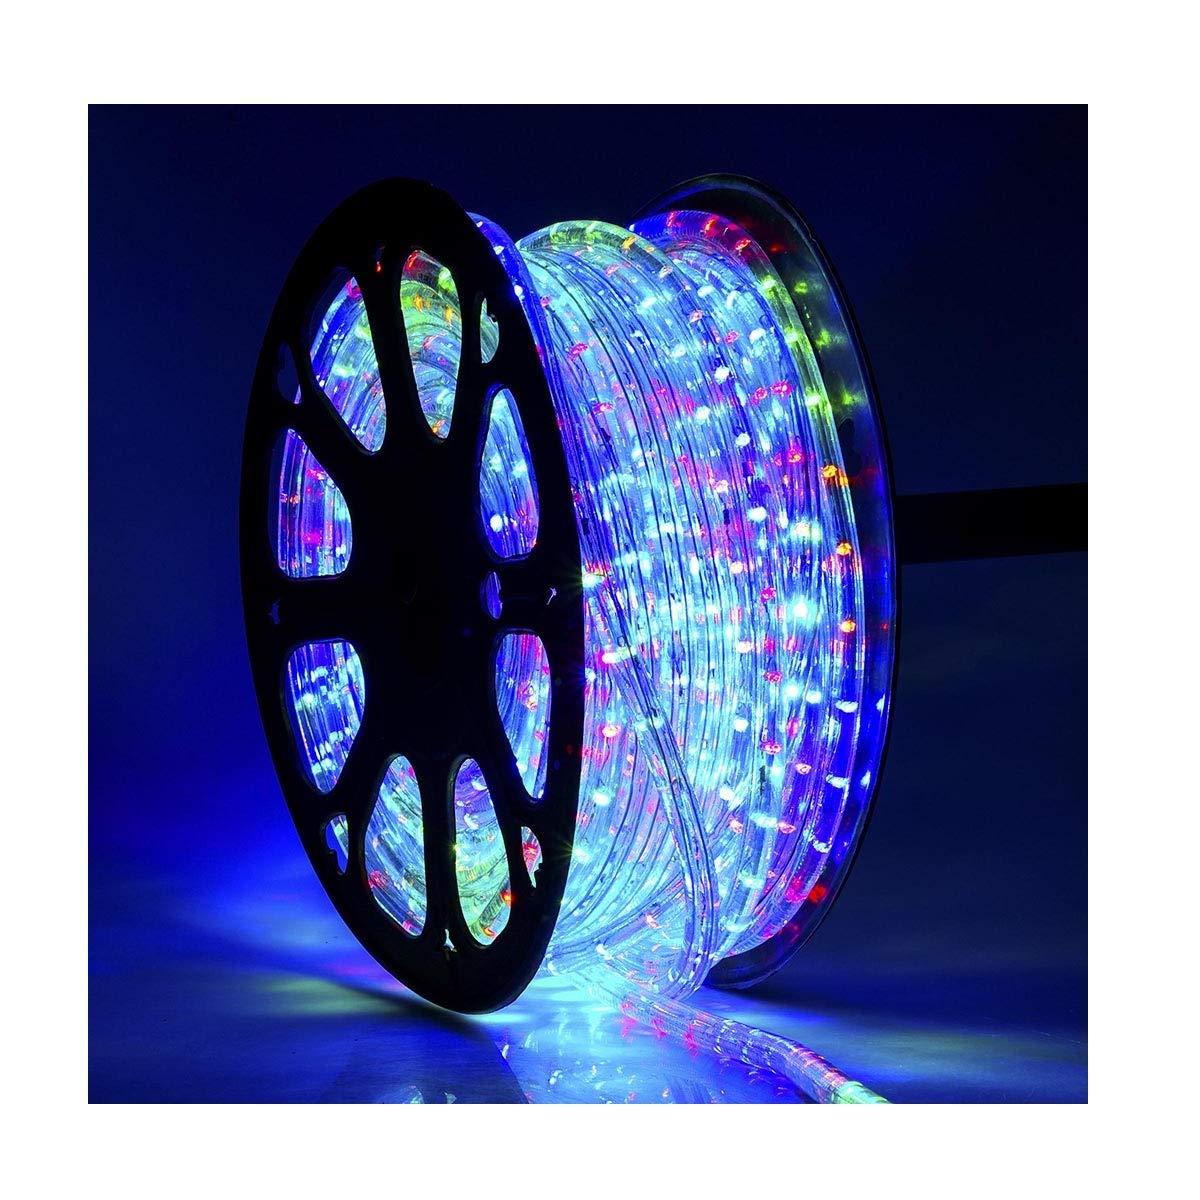 Buy Mufasa Waterproof PVC LED Strip Light Roll, 20 m